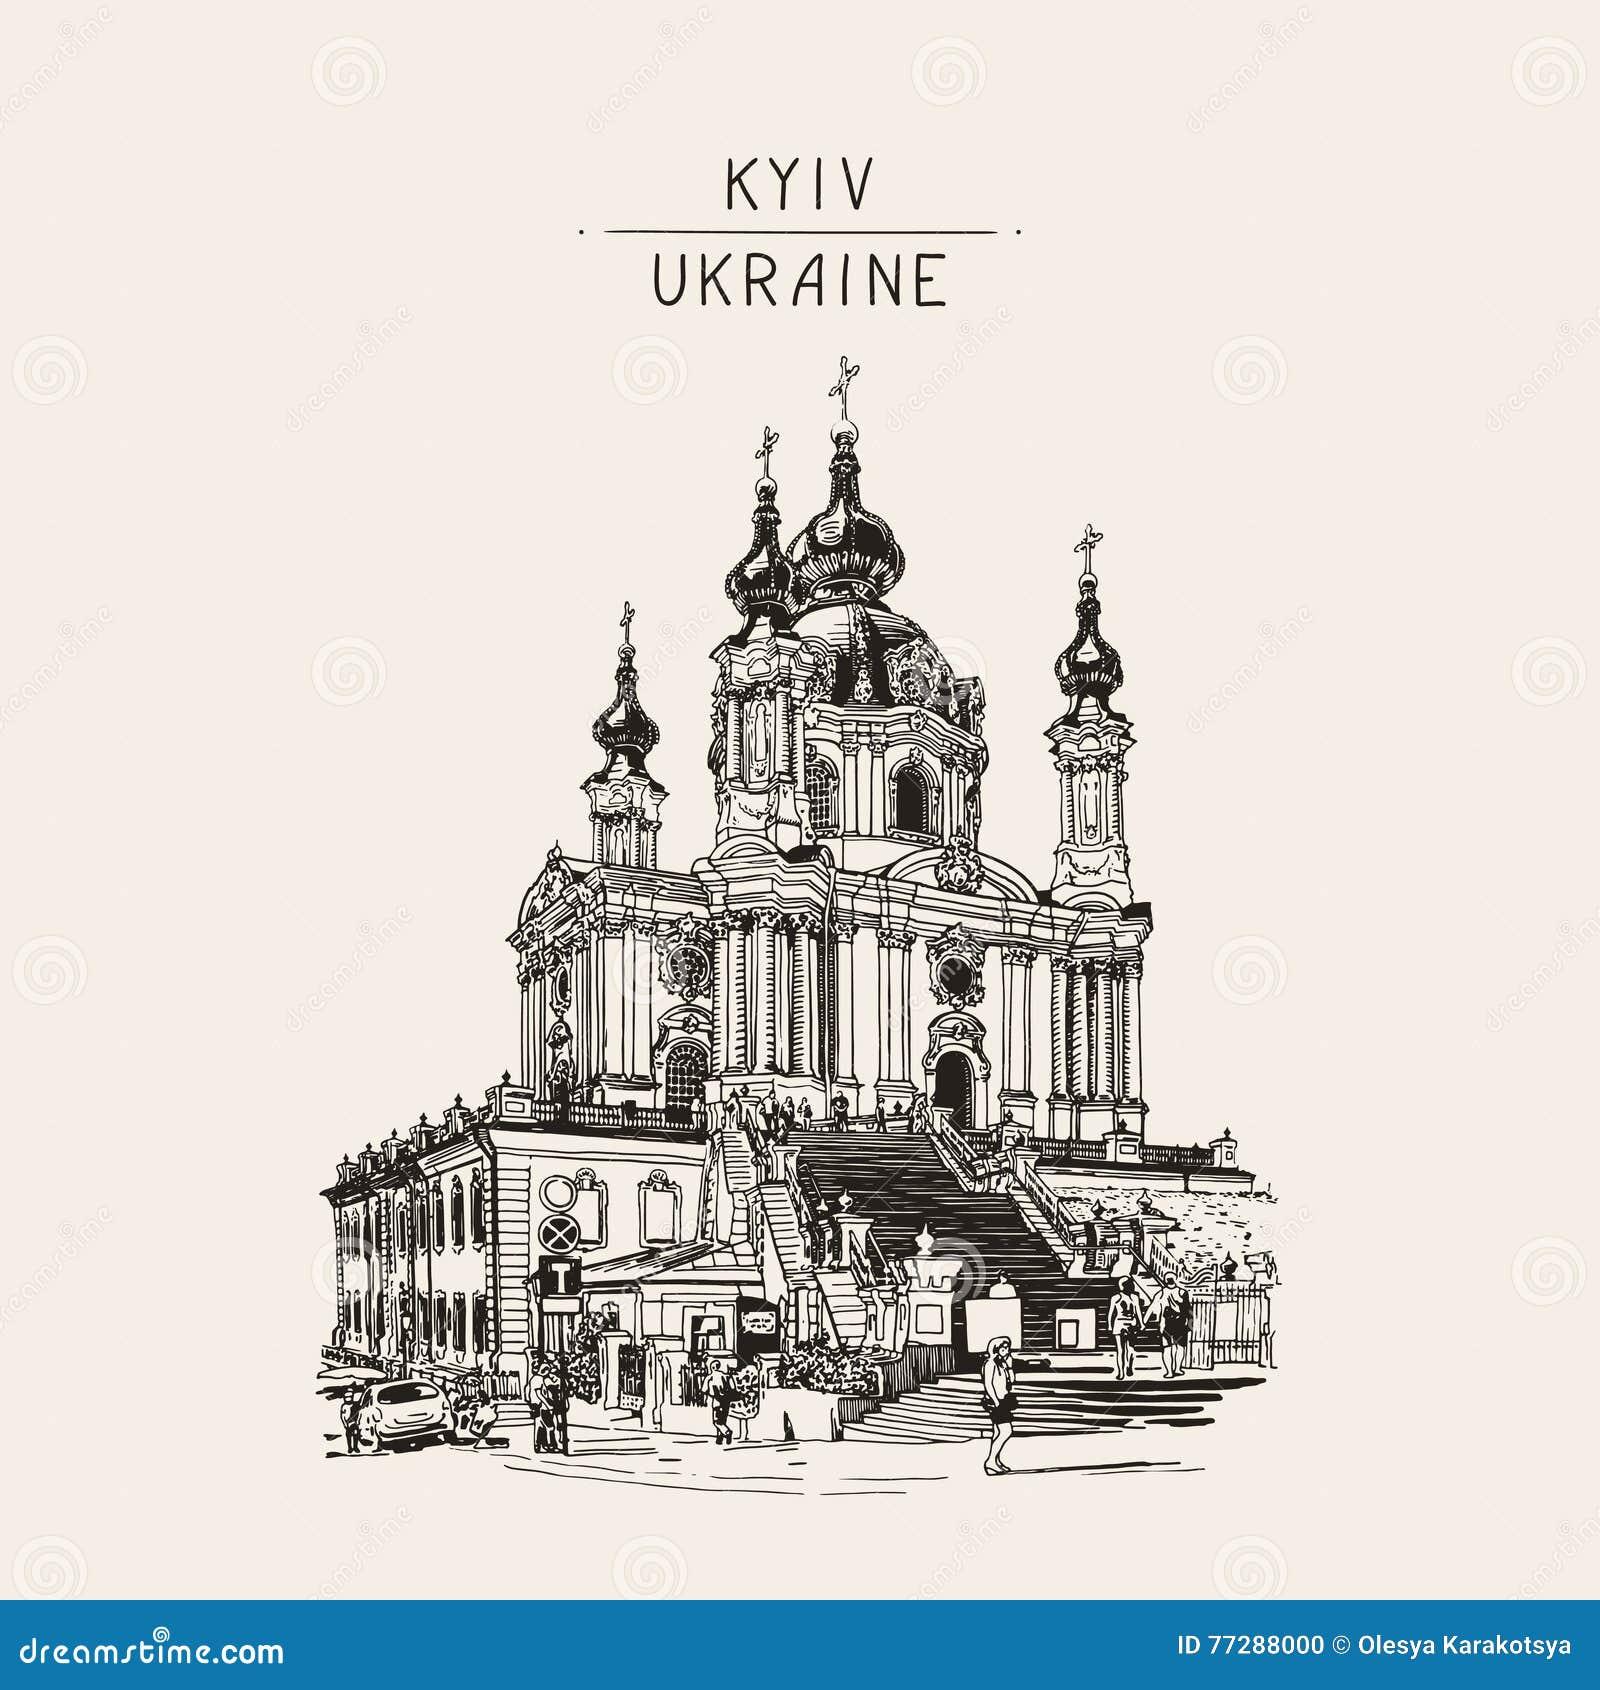 Drawing of Saint Andrew orthodox church by Rastrelli in Kyiv Ki